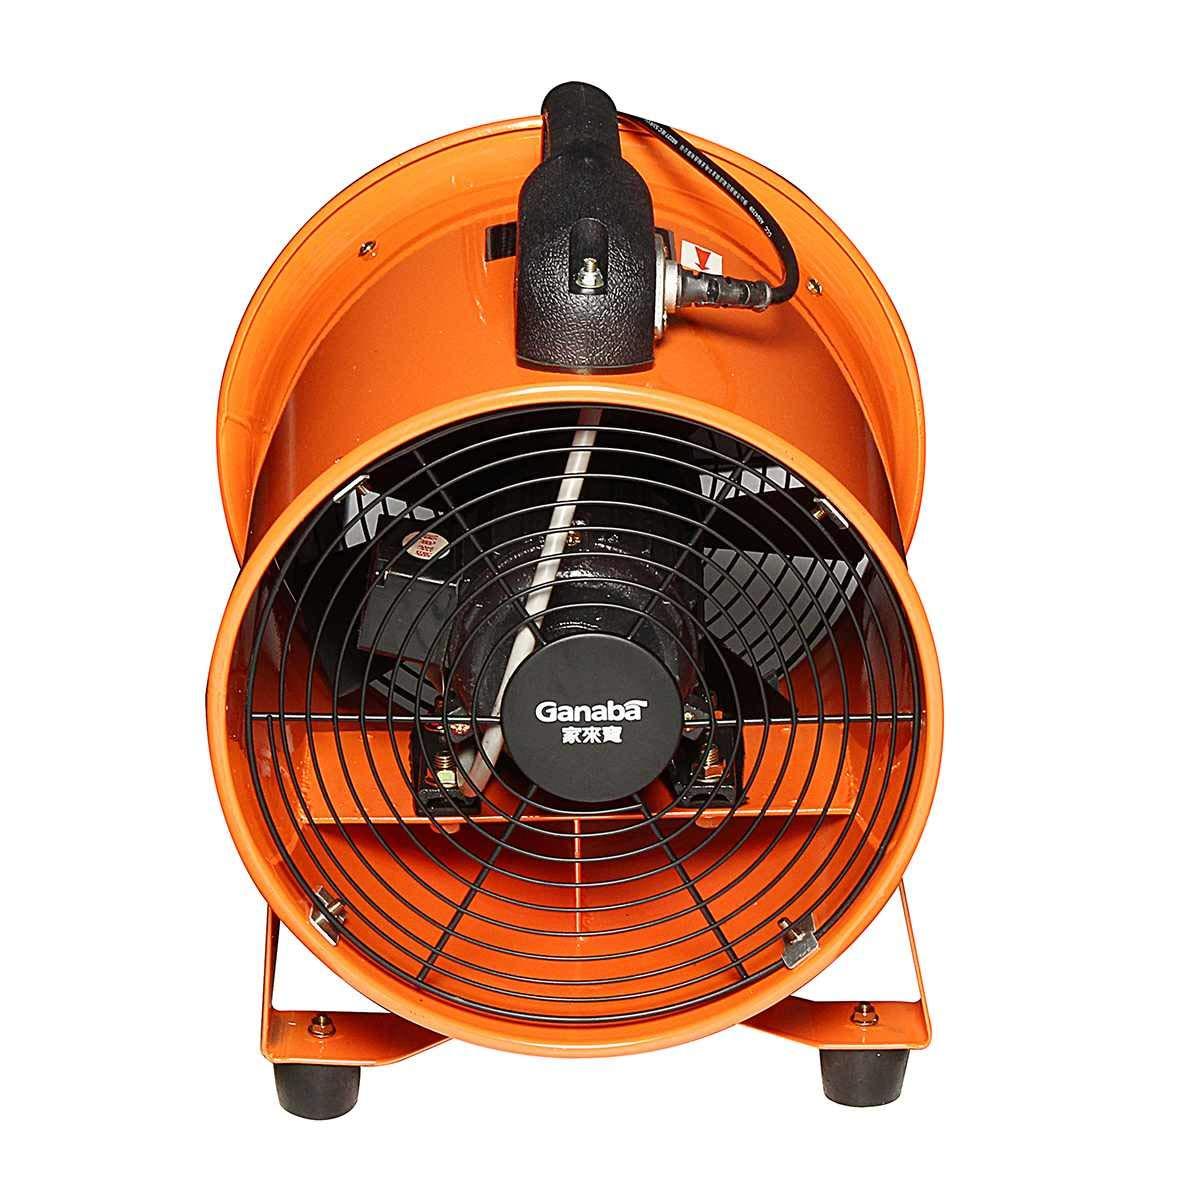 Electric Car Fan180W 220V 10 inch portable blower fan extractor industrial garage high rotating fan ventilation car electrical by CZPF